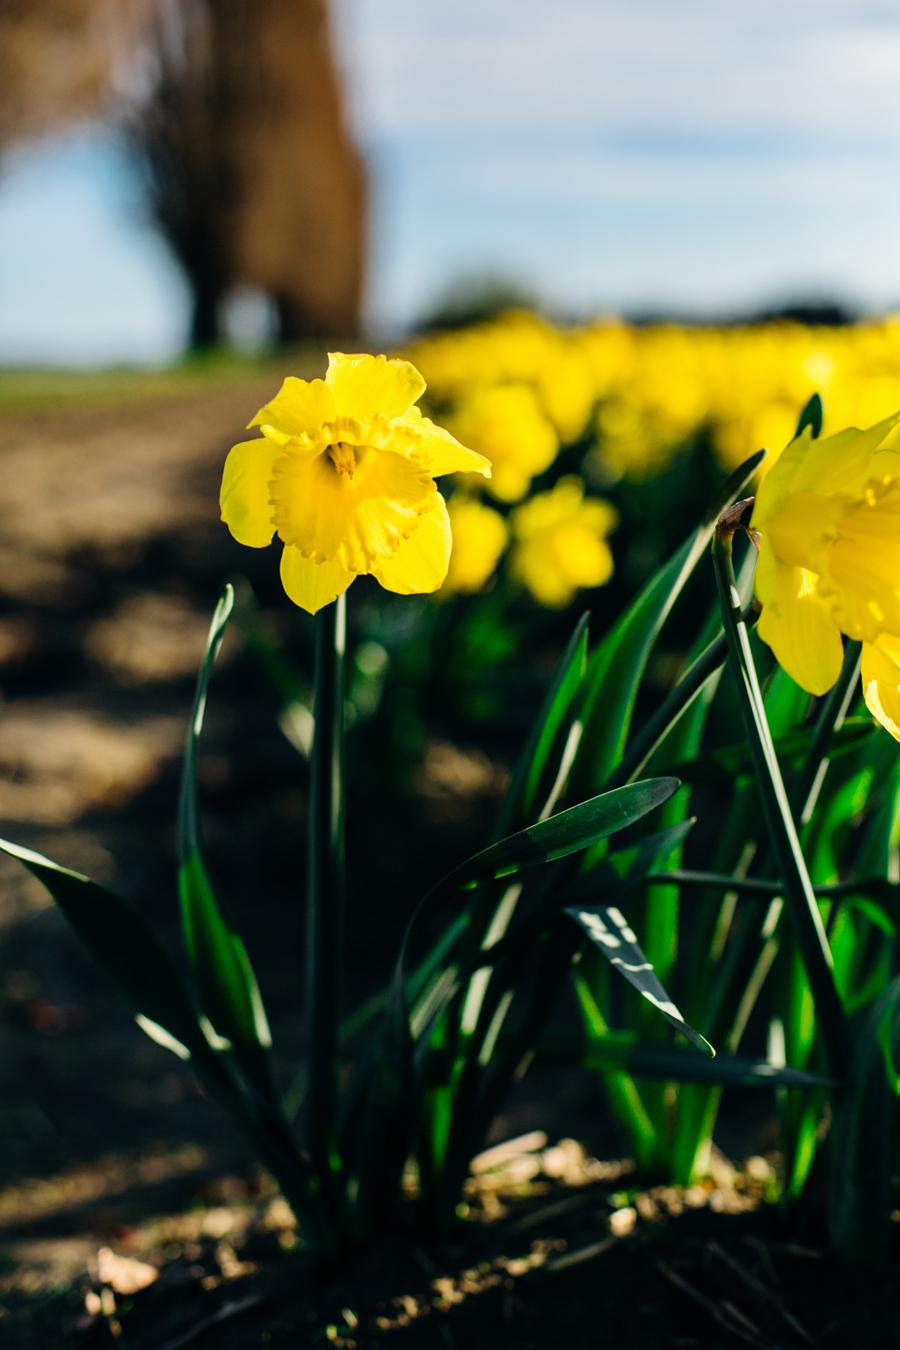 003-skagit-vallery-mount-vernon-washington-daffodils-tulip-festival-katheryn-moran-photography.jpg